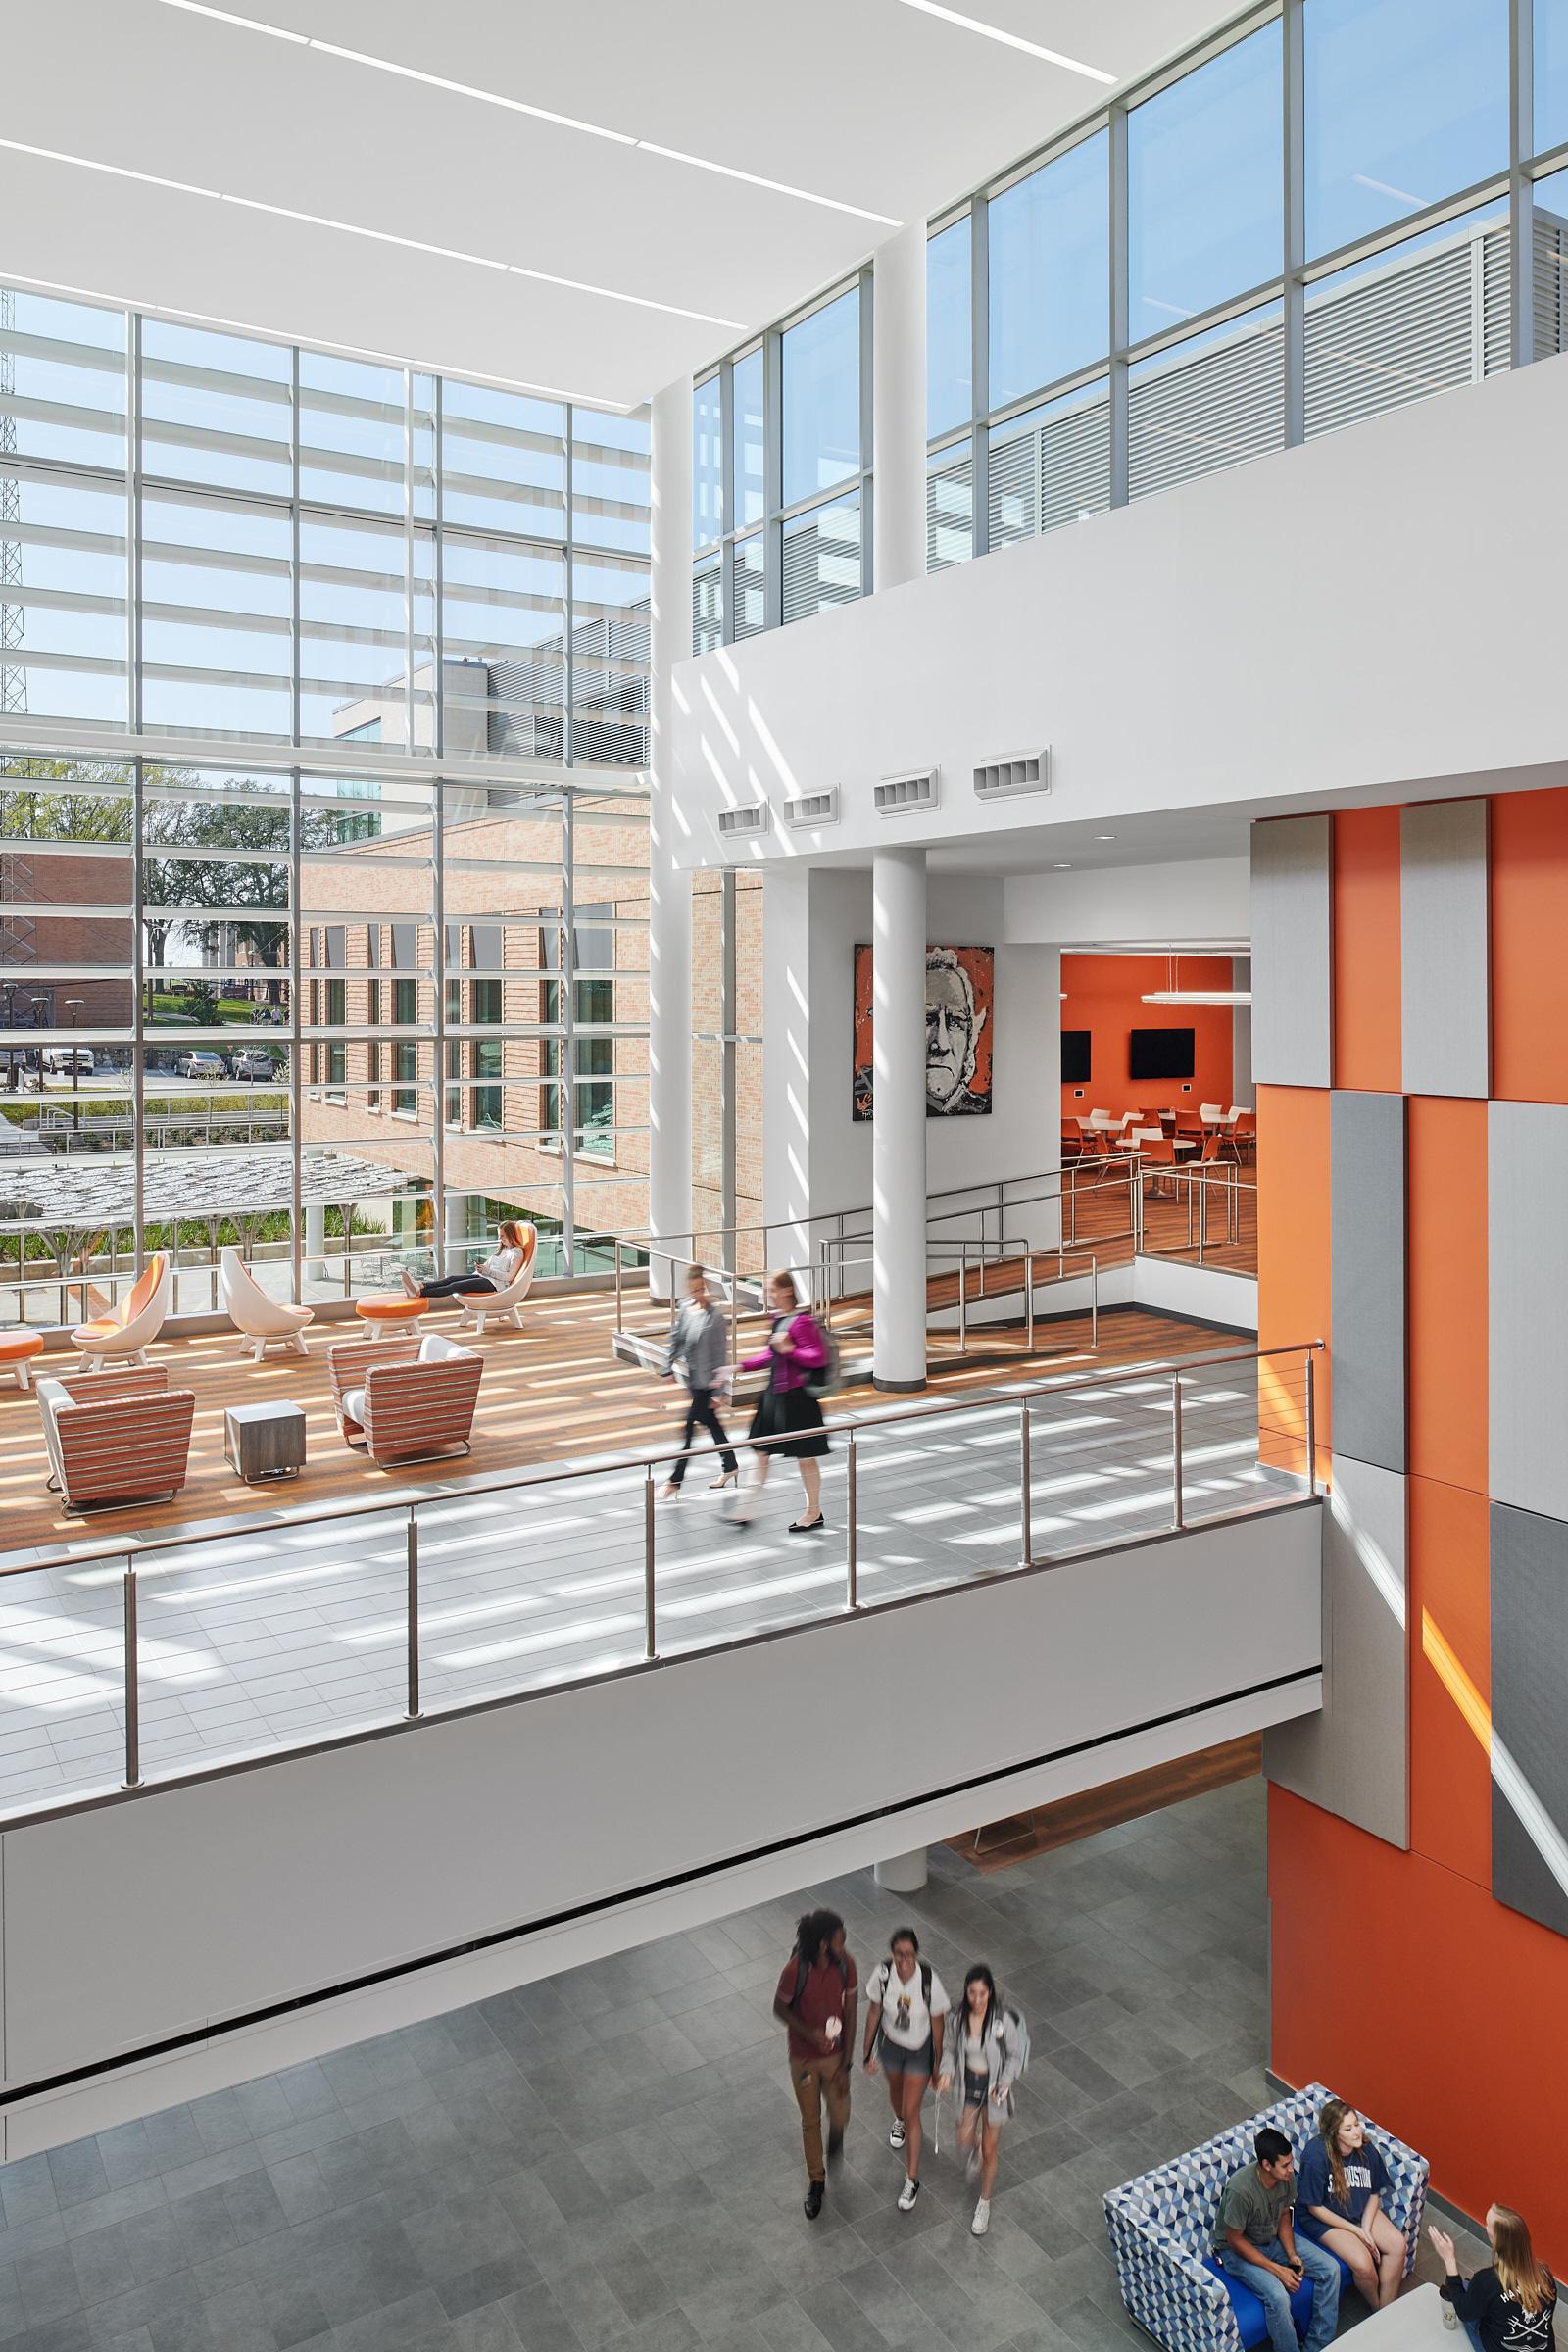 SHSU Lowman Student Center